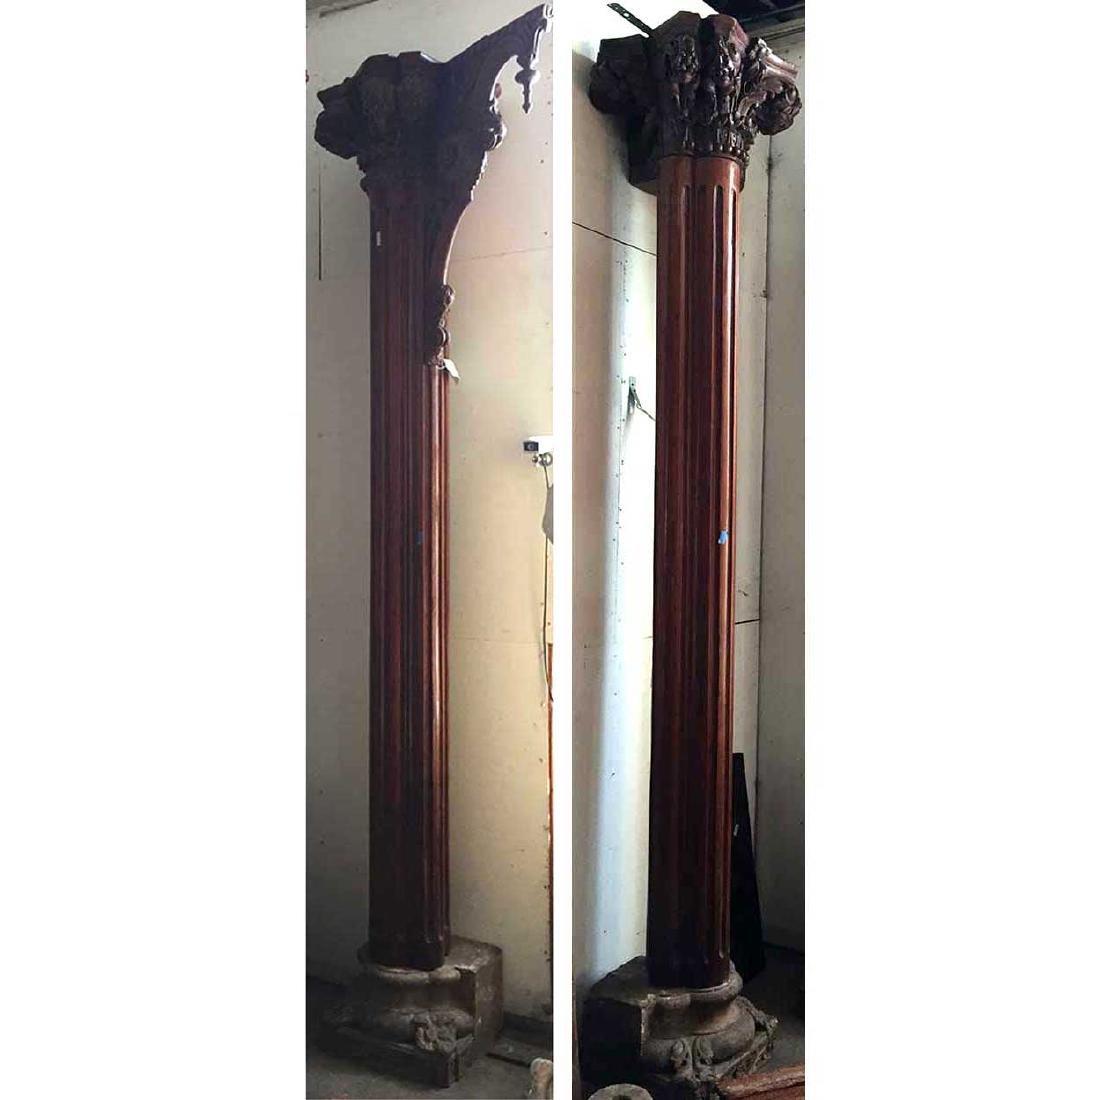 Indian Teak Haveli 3-Sided Pillar and Bracket